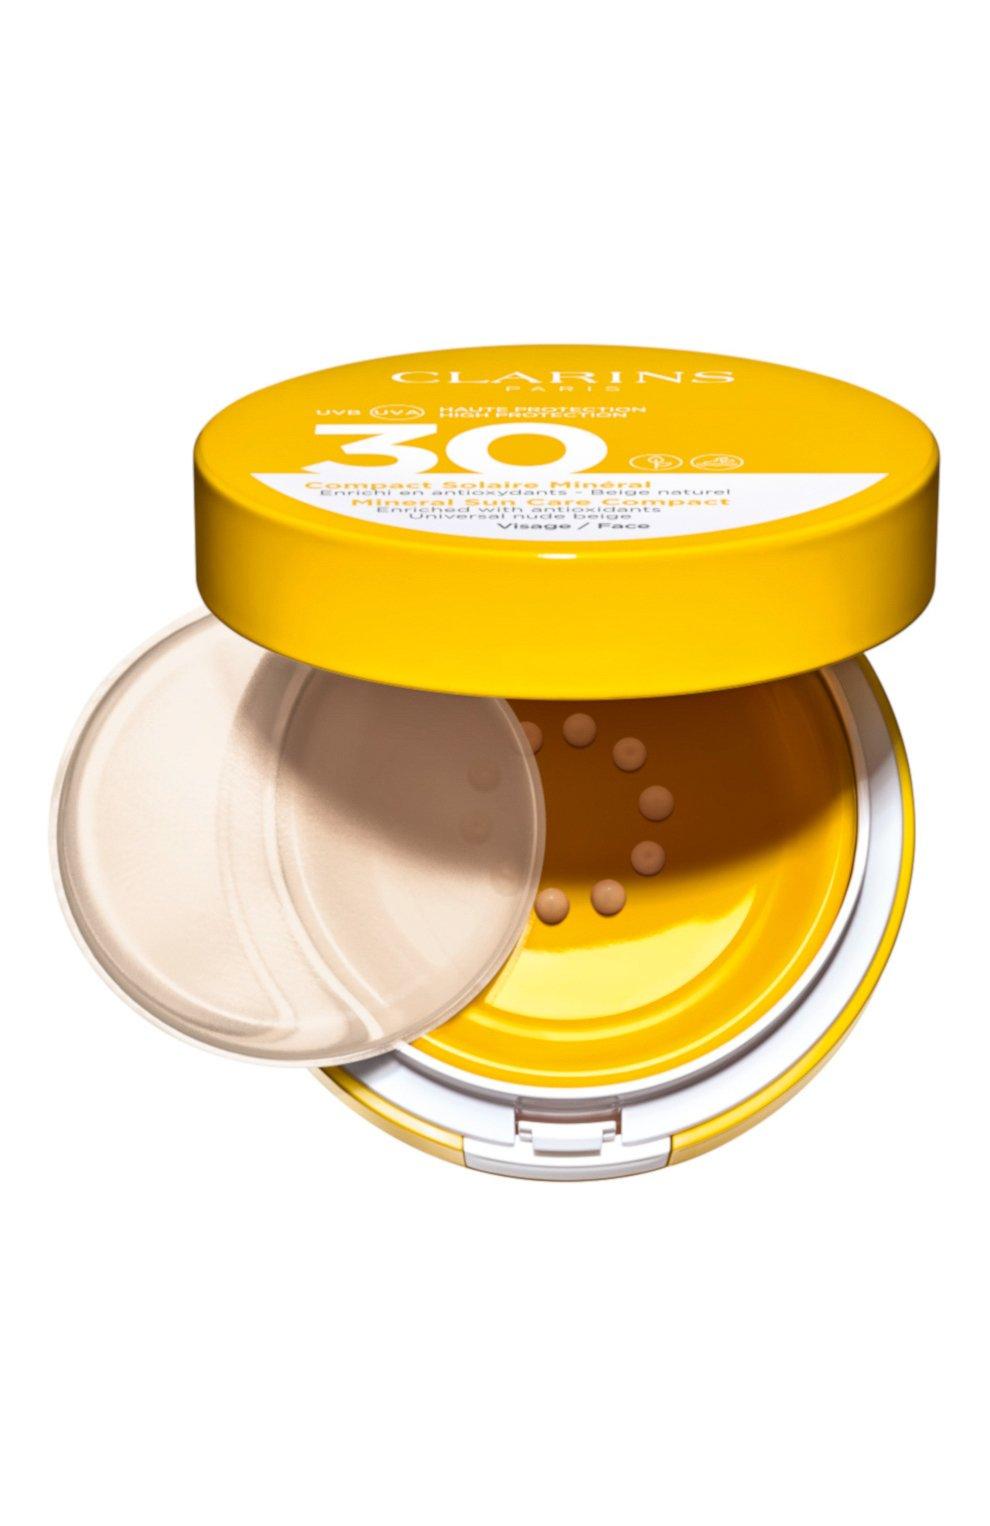 Cолнцезащитный флюид для лица с легким тоном SPF 30 | Фото №1